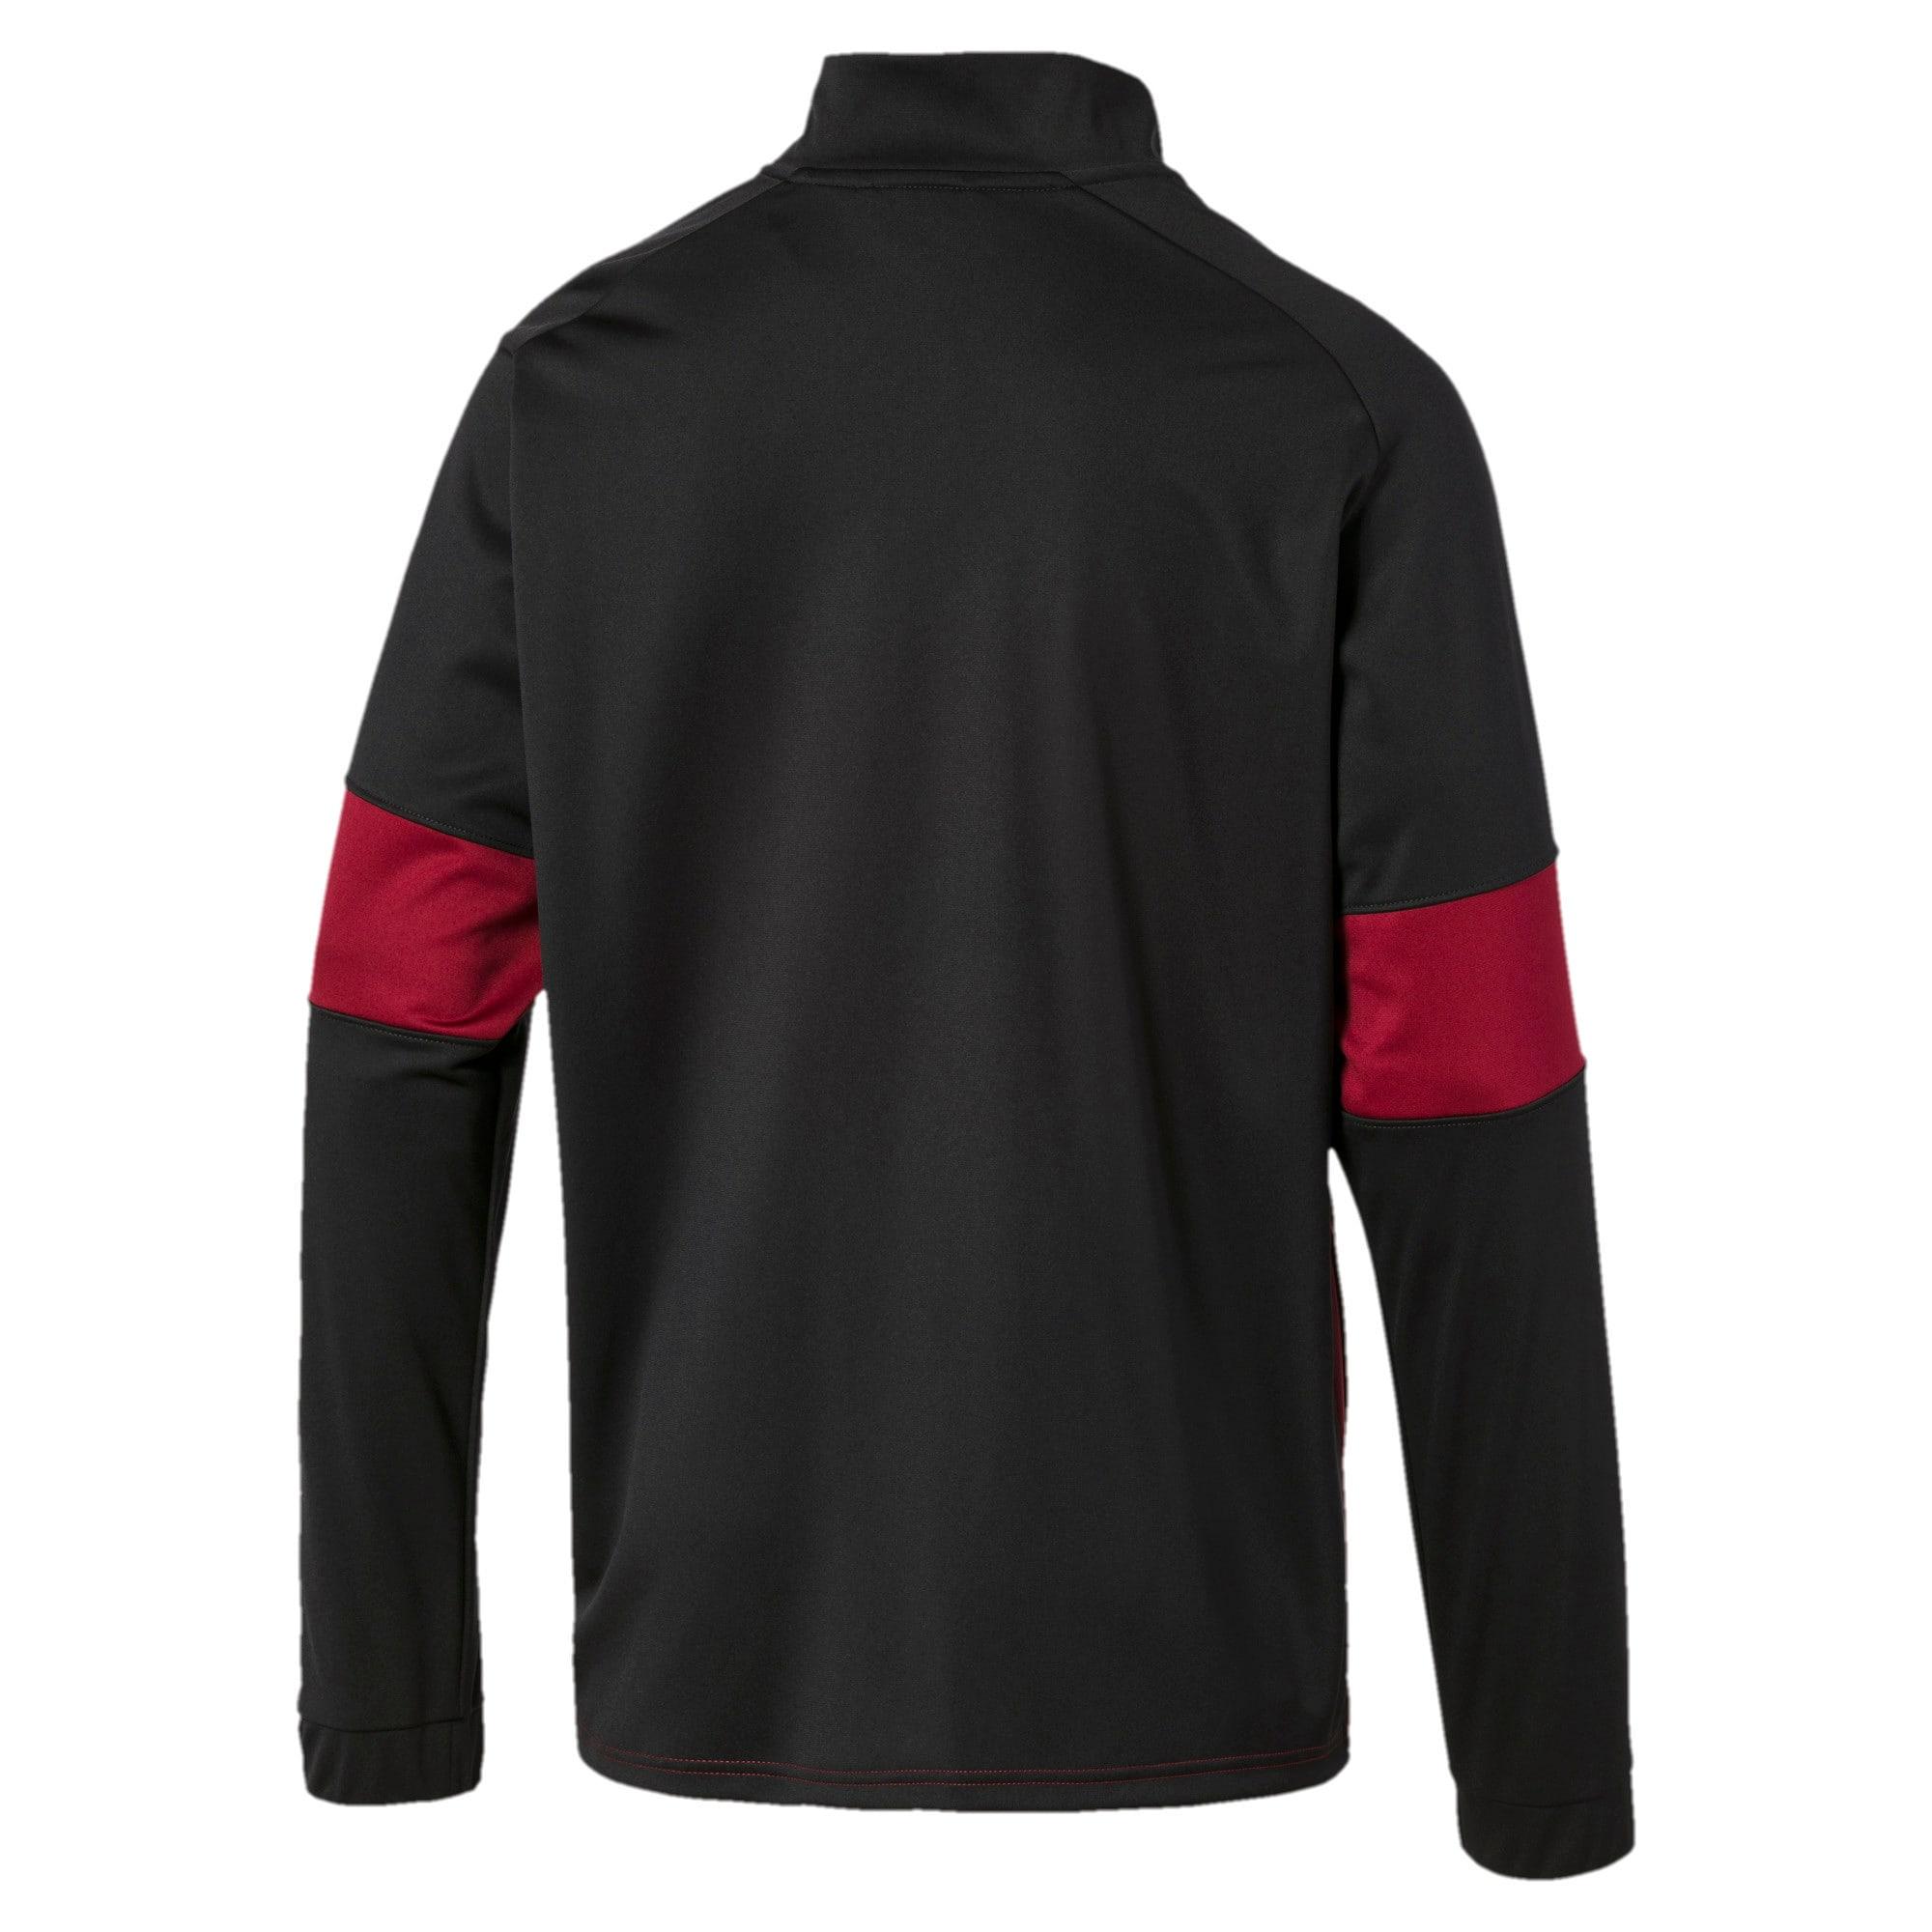 Thumbnail 5 of Blaster Men's Jacket, Puma Black-Rhubarb, medium-IND